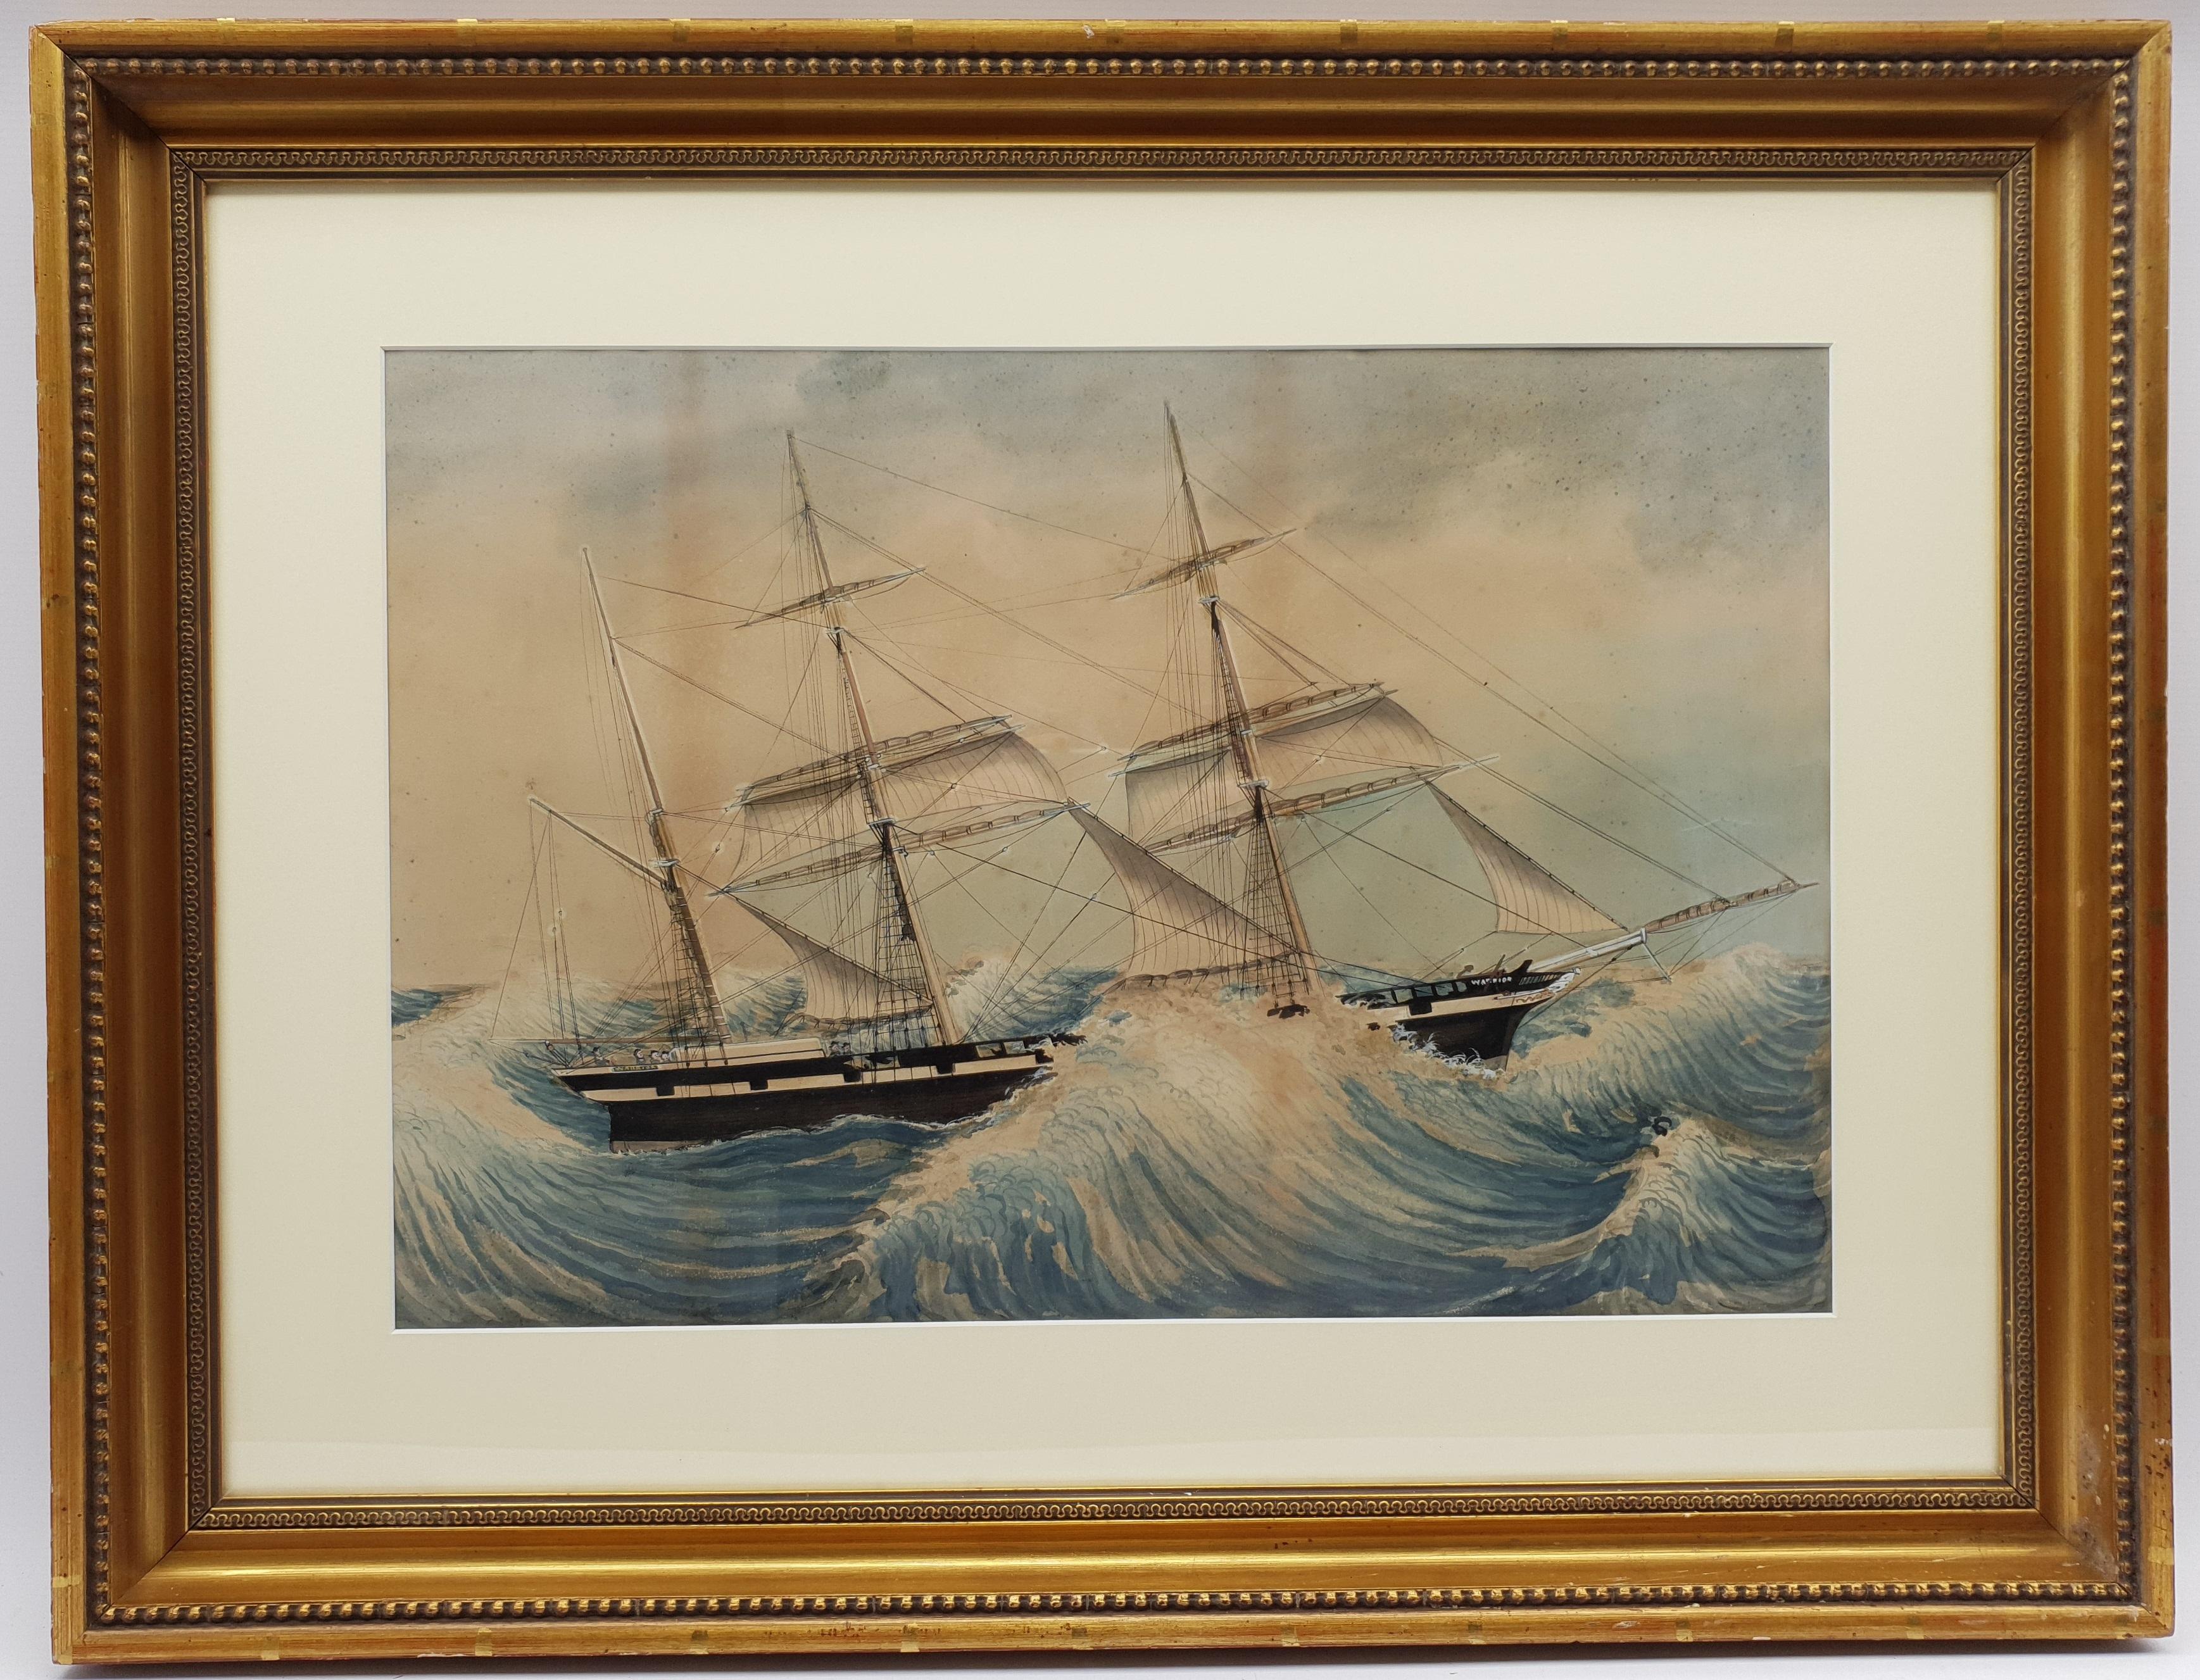 English School (19th century): HMS Warrior in Rough Seas - Ship's Portrait, watercolour unsigned 58c - Image 2 of 2